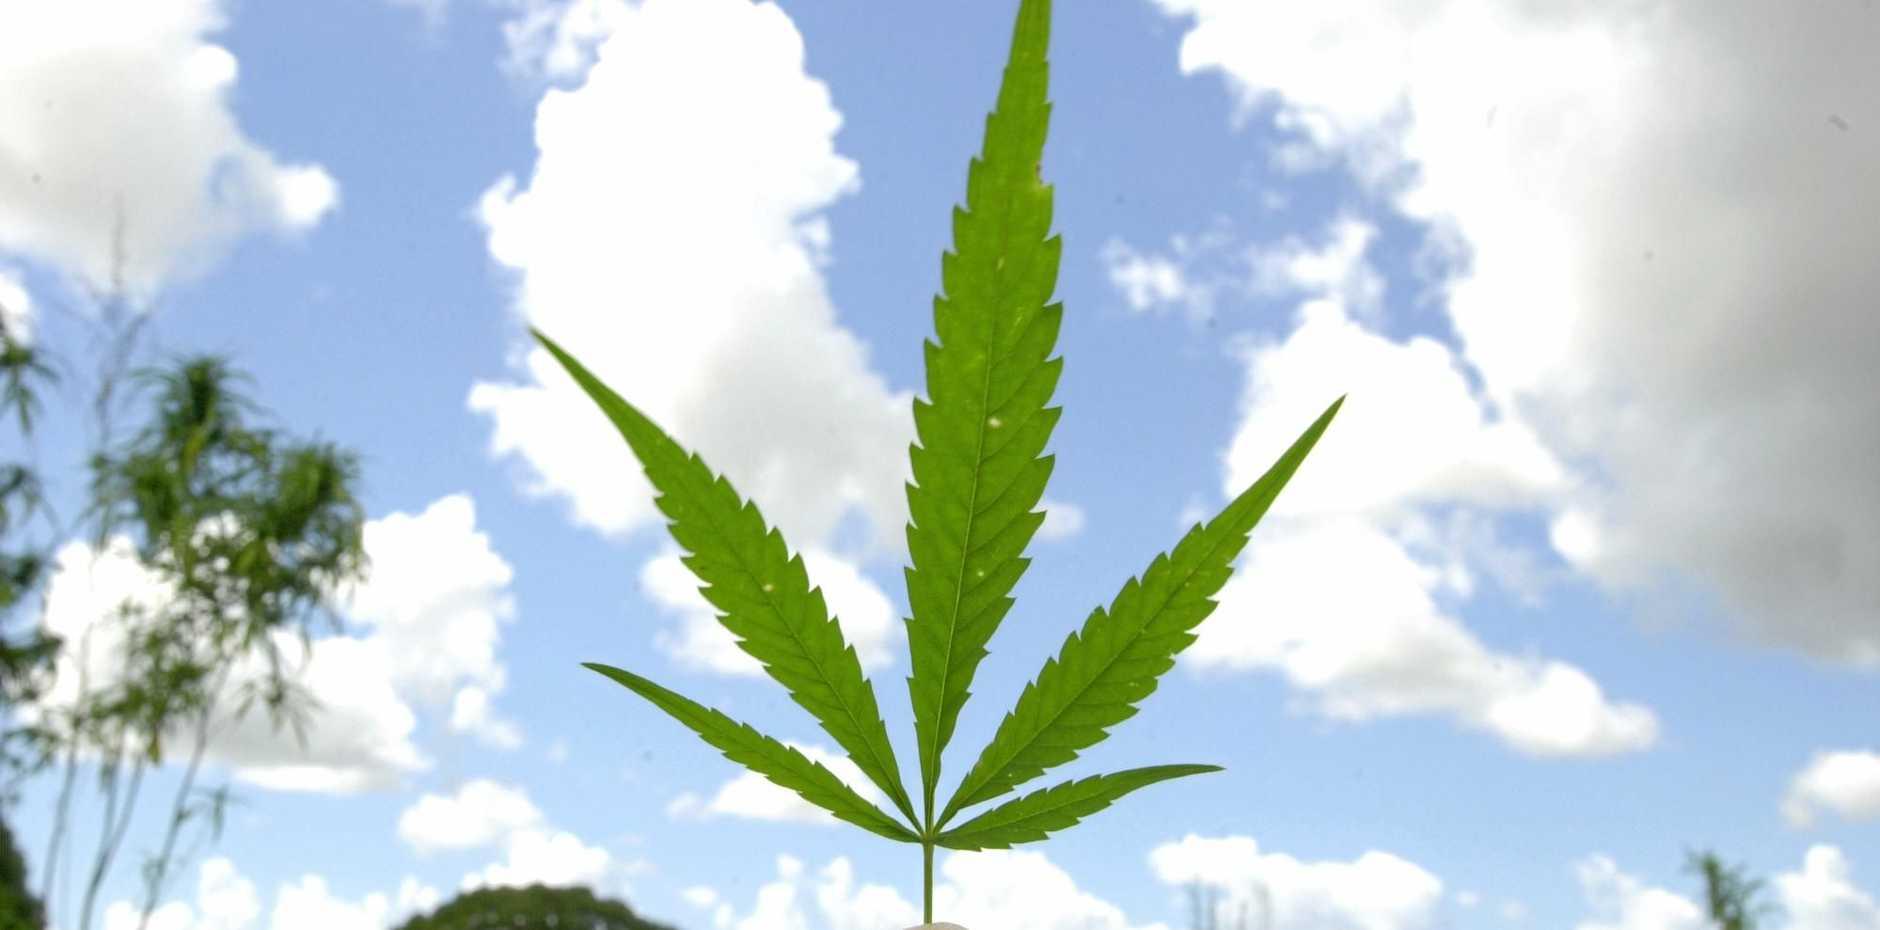 PUF Ventures Australia has announced plans for a major medicinal cannabis research partnership.